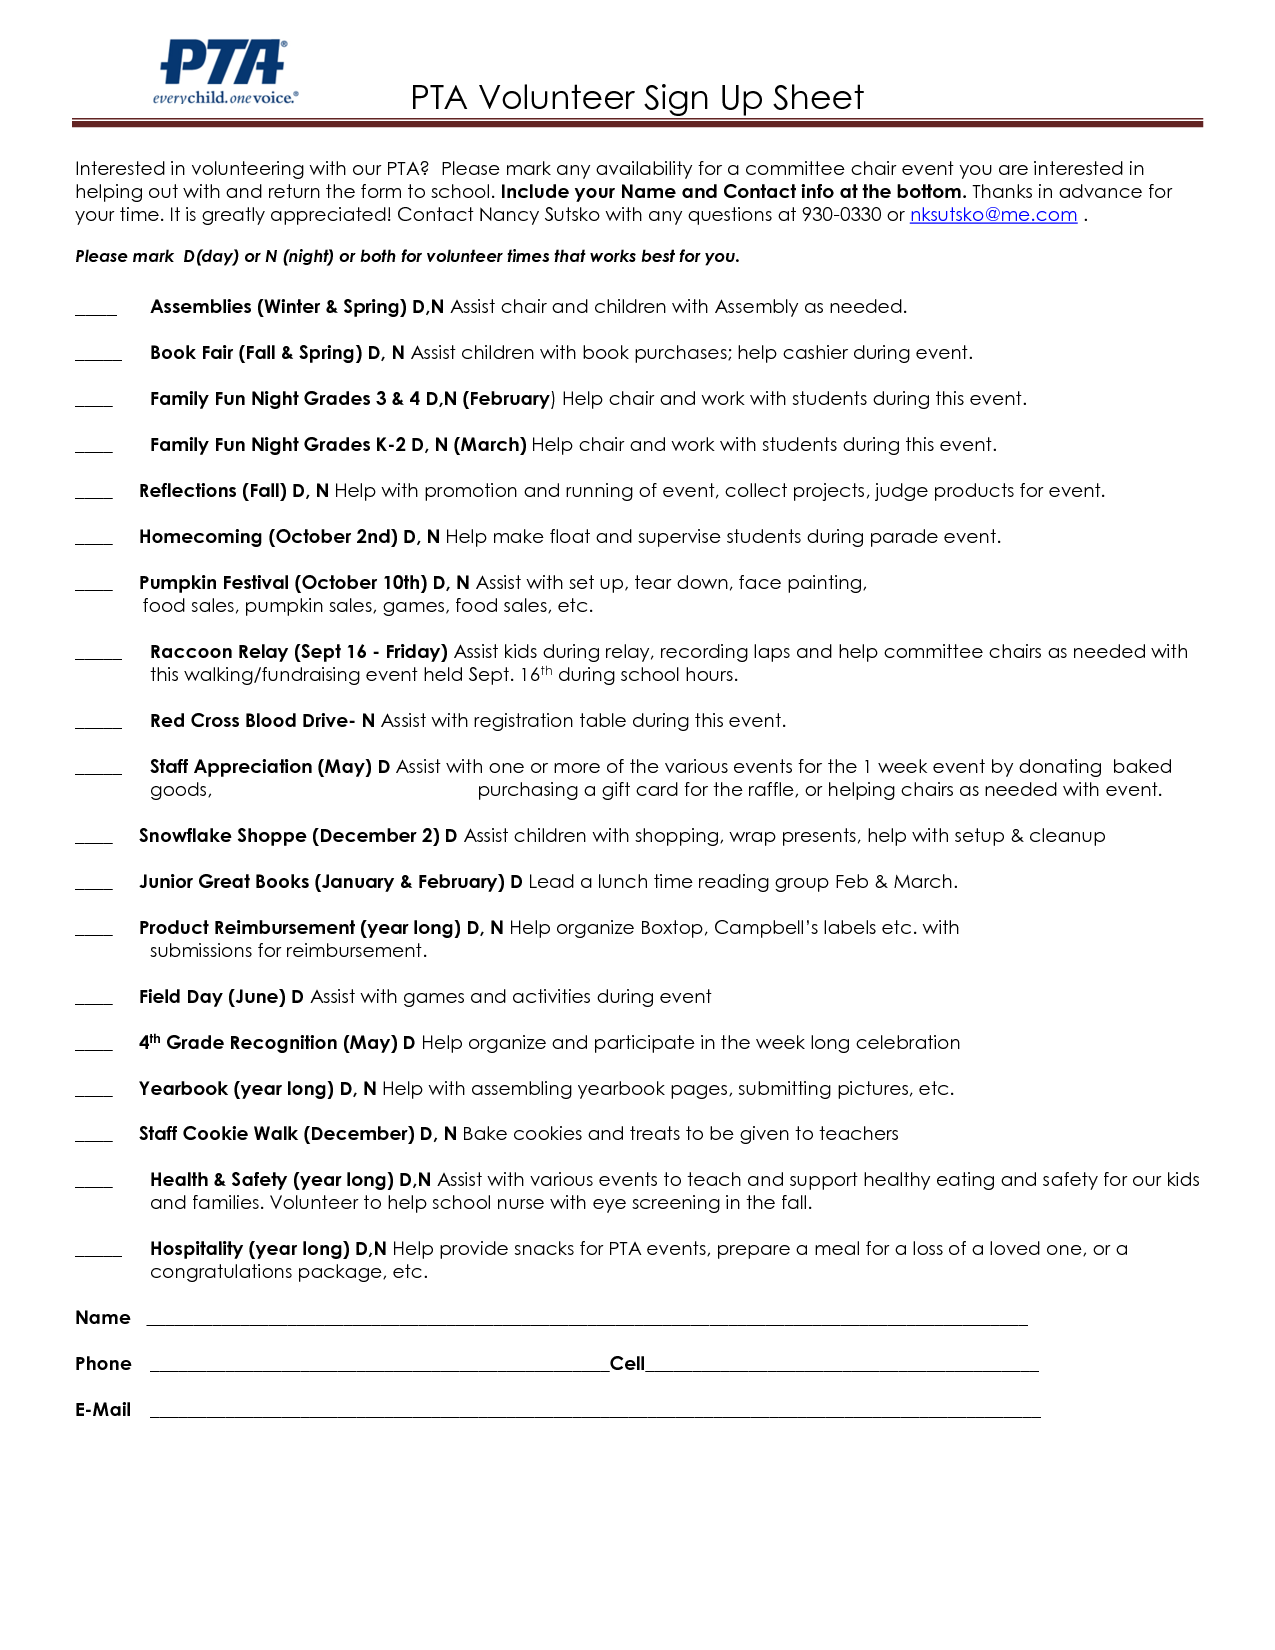 pta volunteer sign up sheets google search pta pta pta school